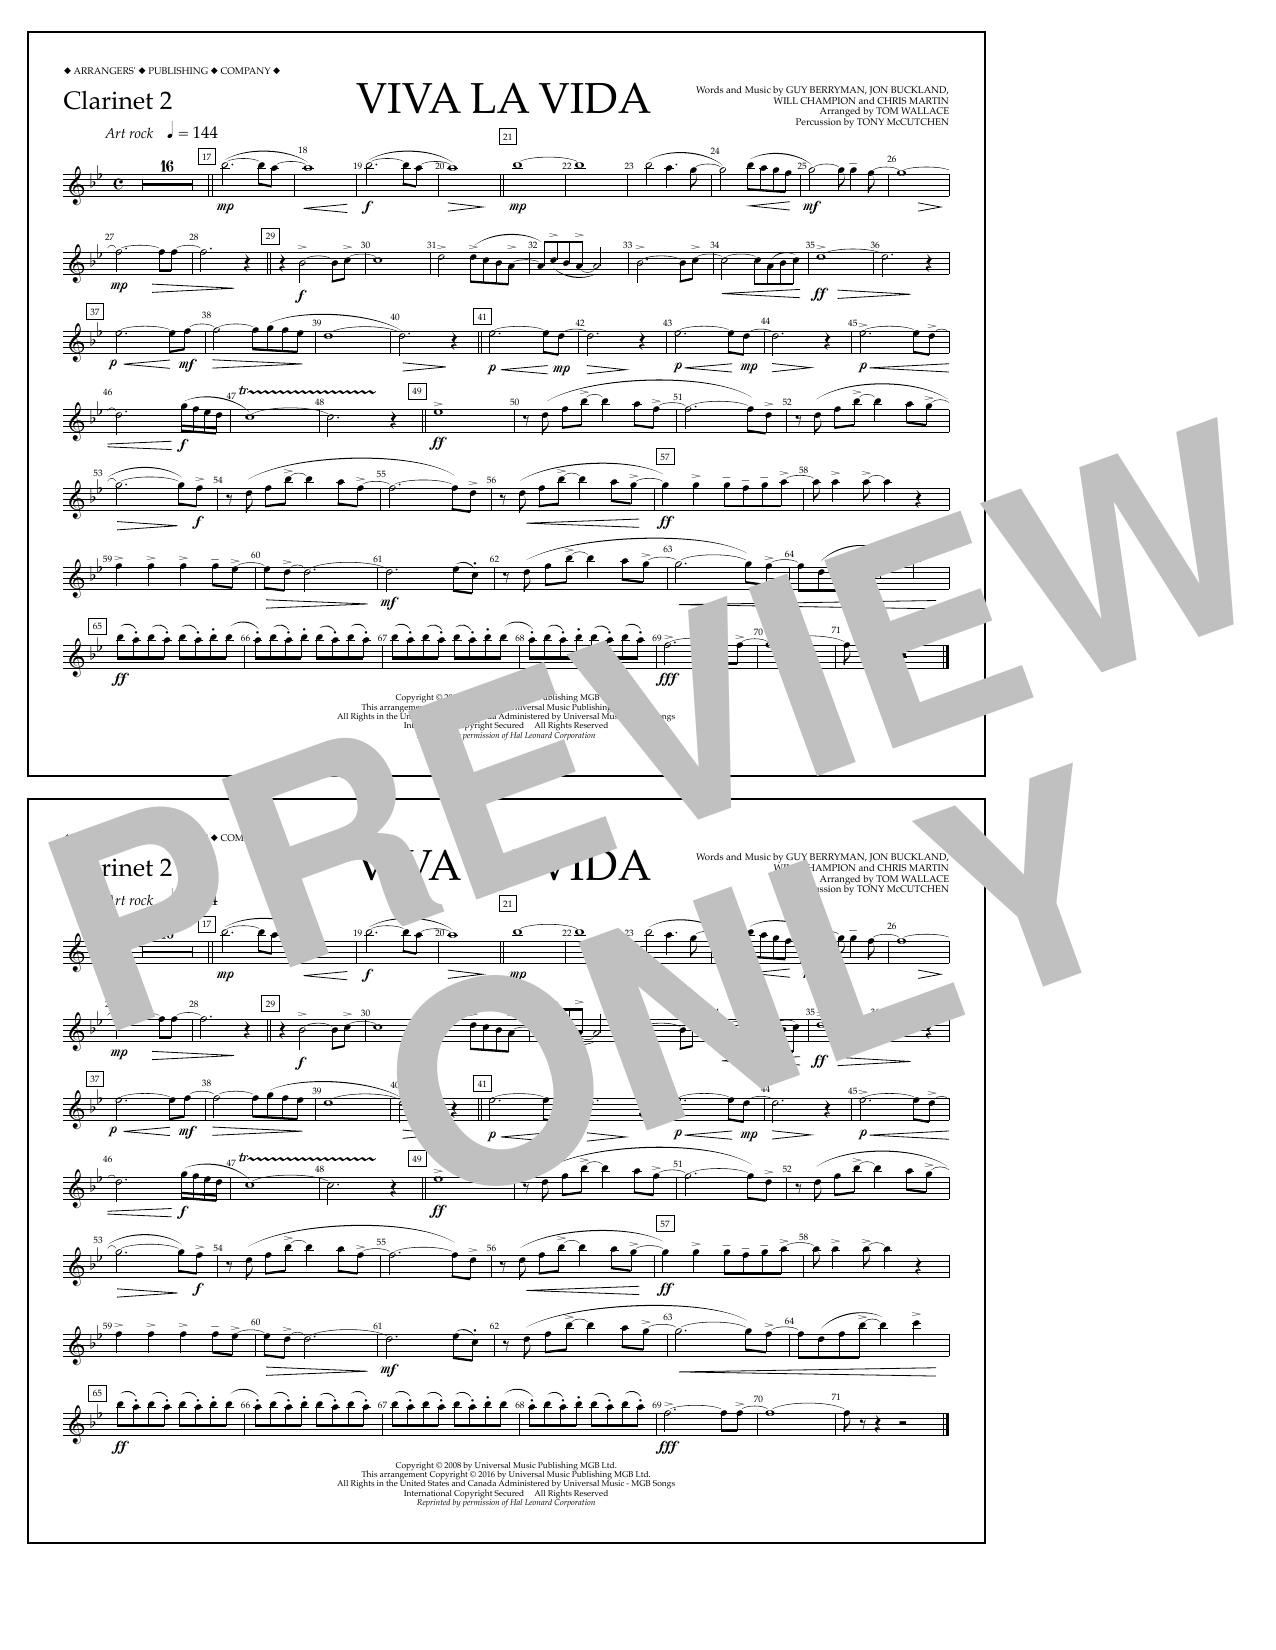 Viva la vida clarinet 2 sheet music at stantons sheet music format marching band hexwebz Choice Image